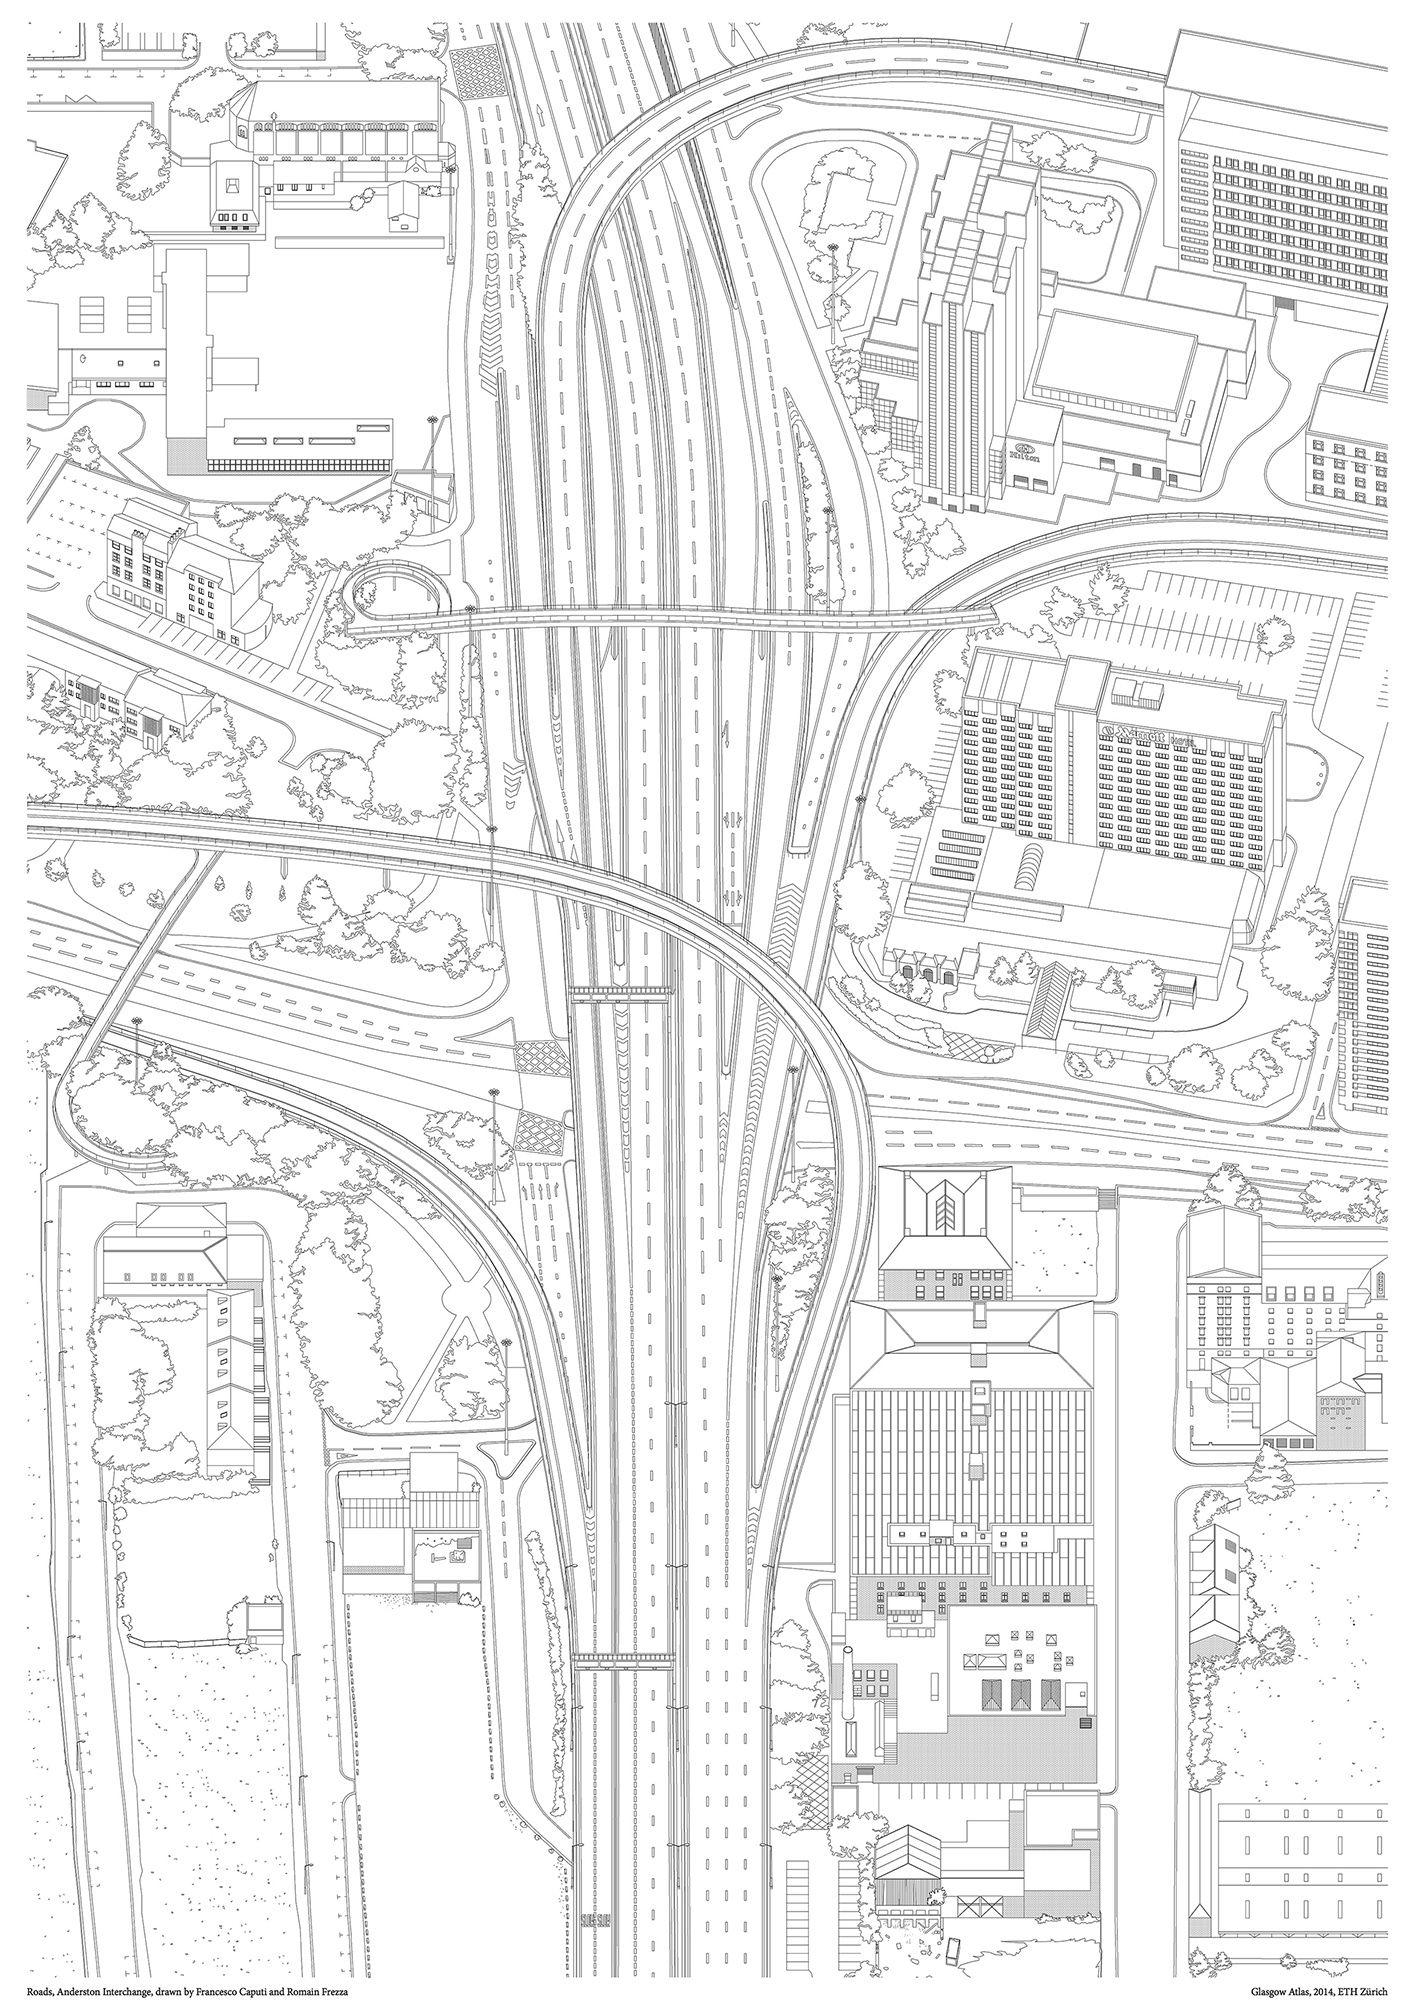 Glasgow Atlas